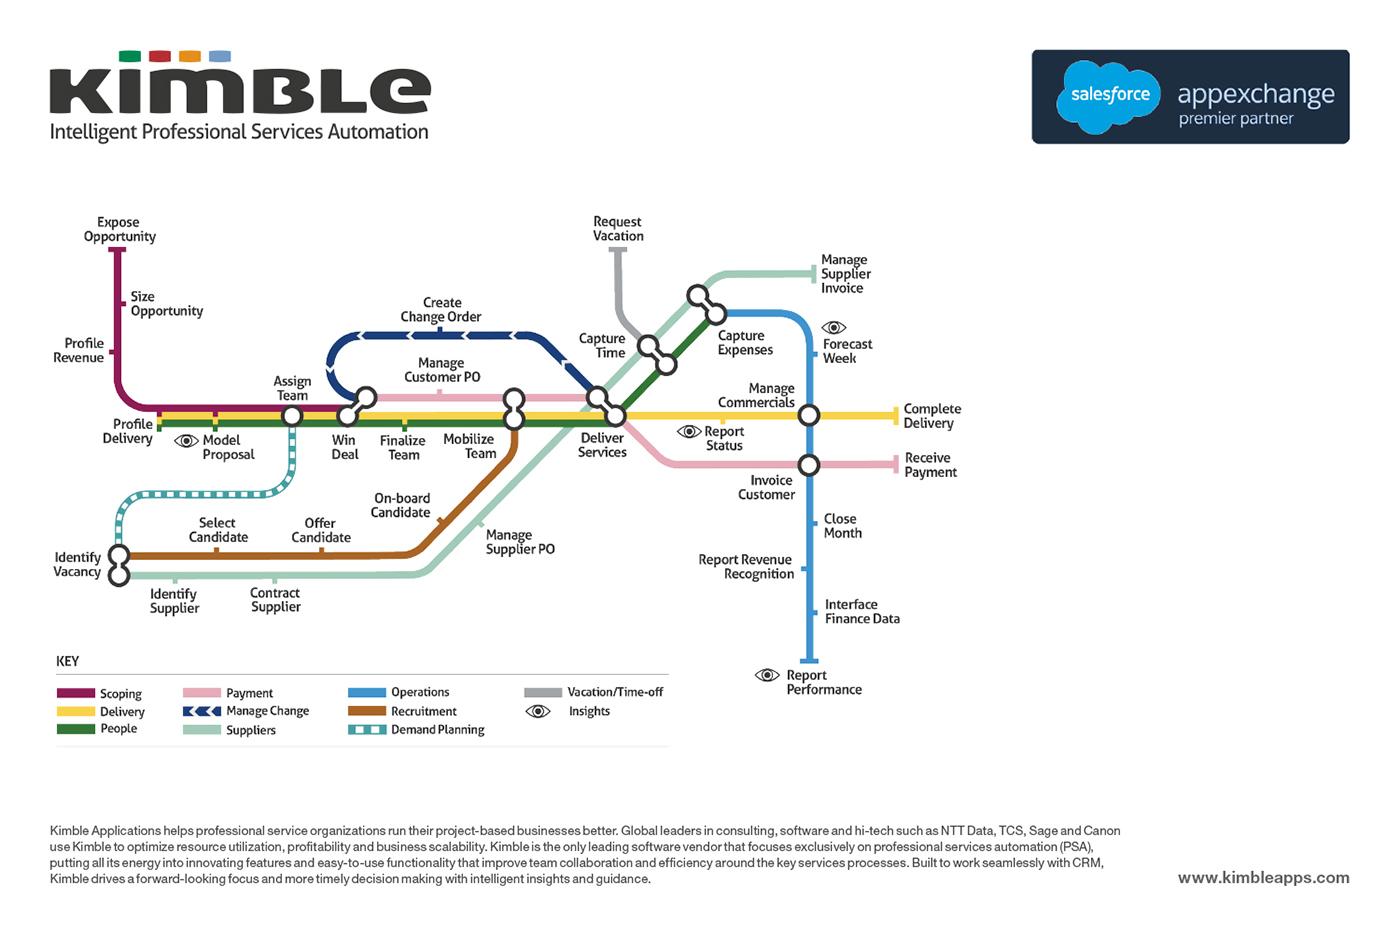 Kimble Software - 13